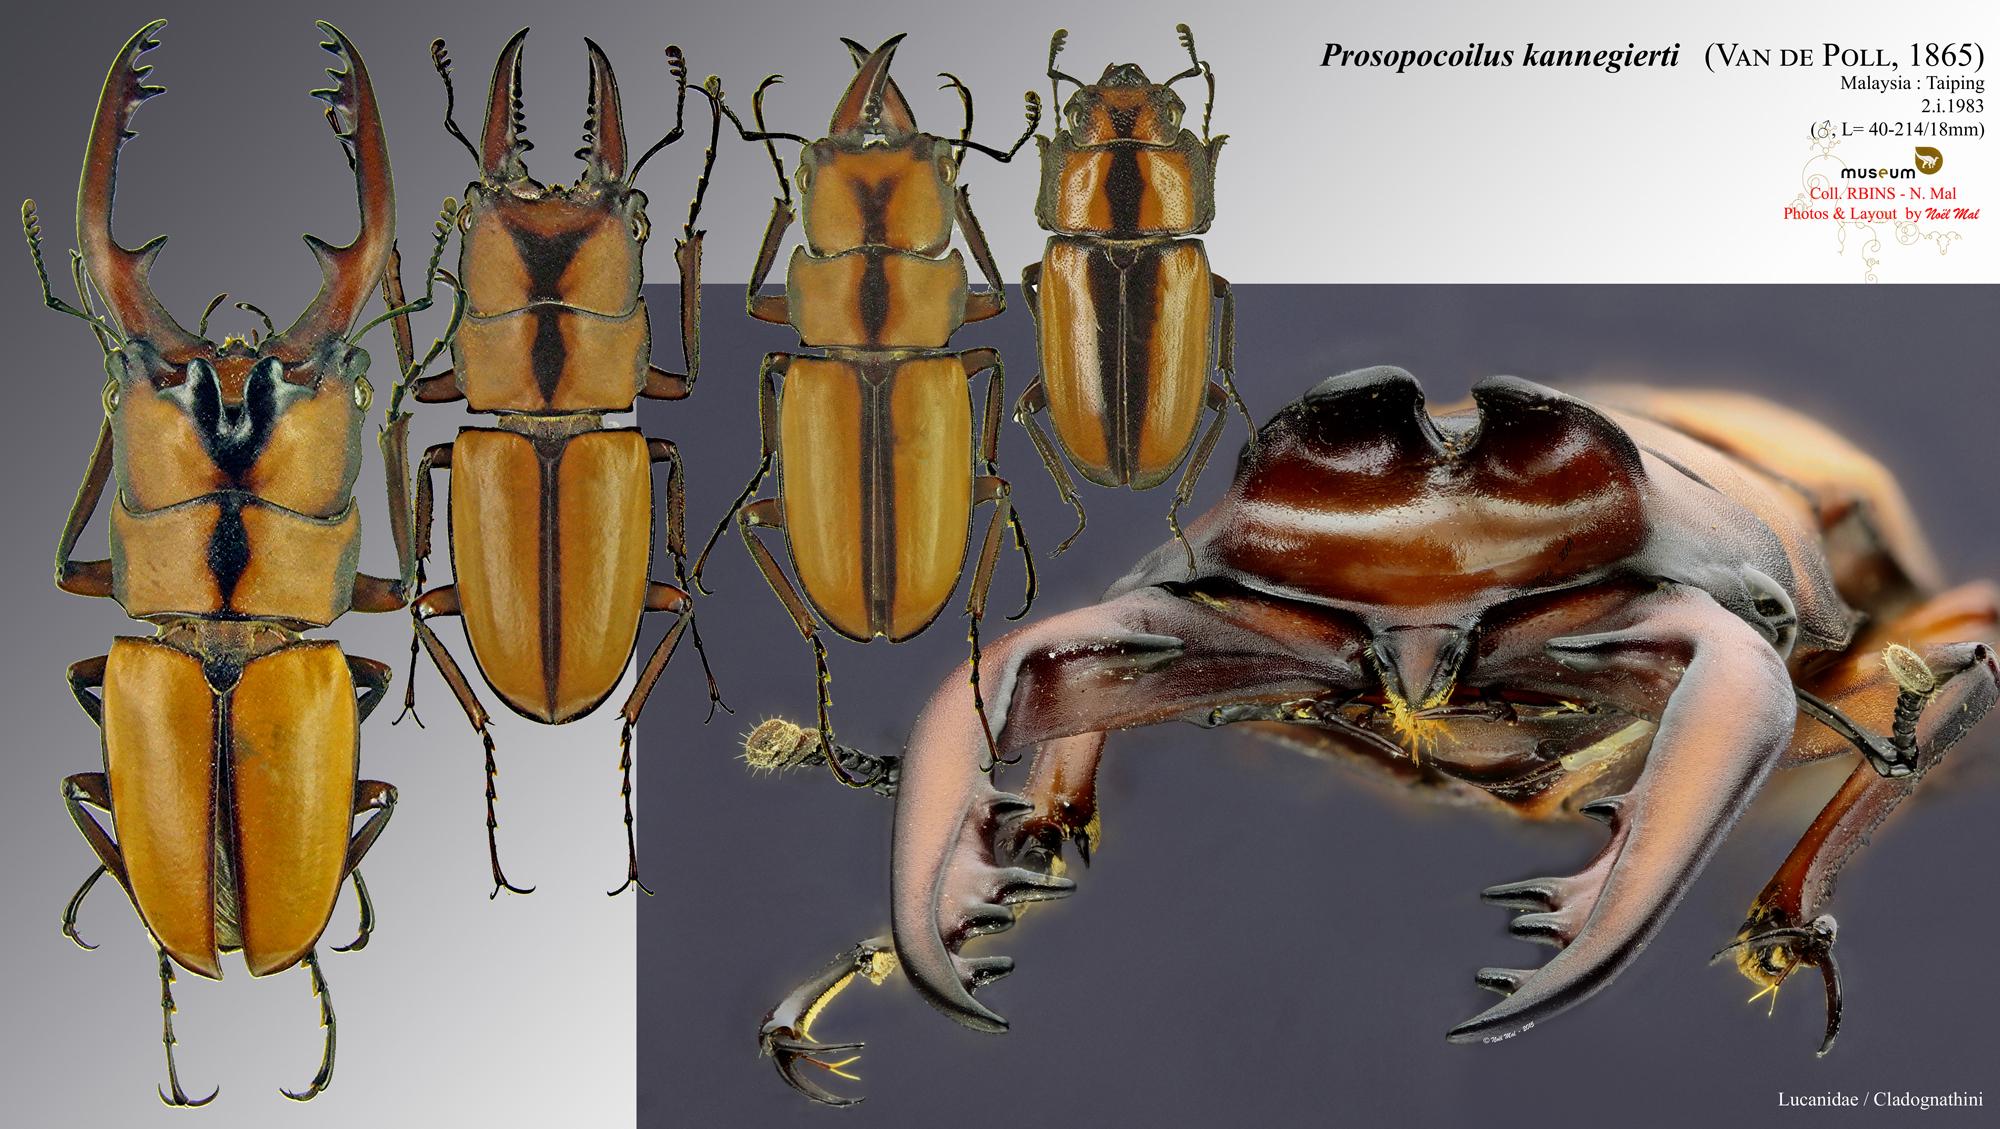 Prosopocoilus (Metopodontus) kannegieteri.jpg